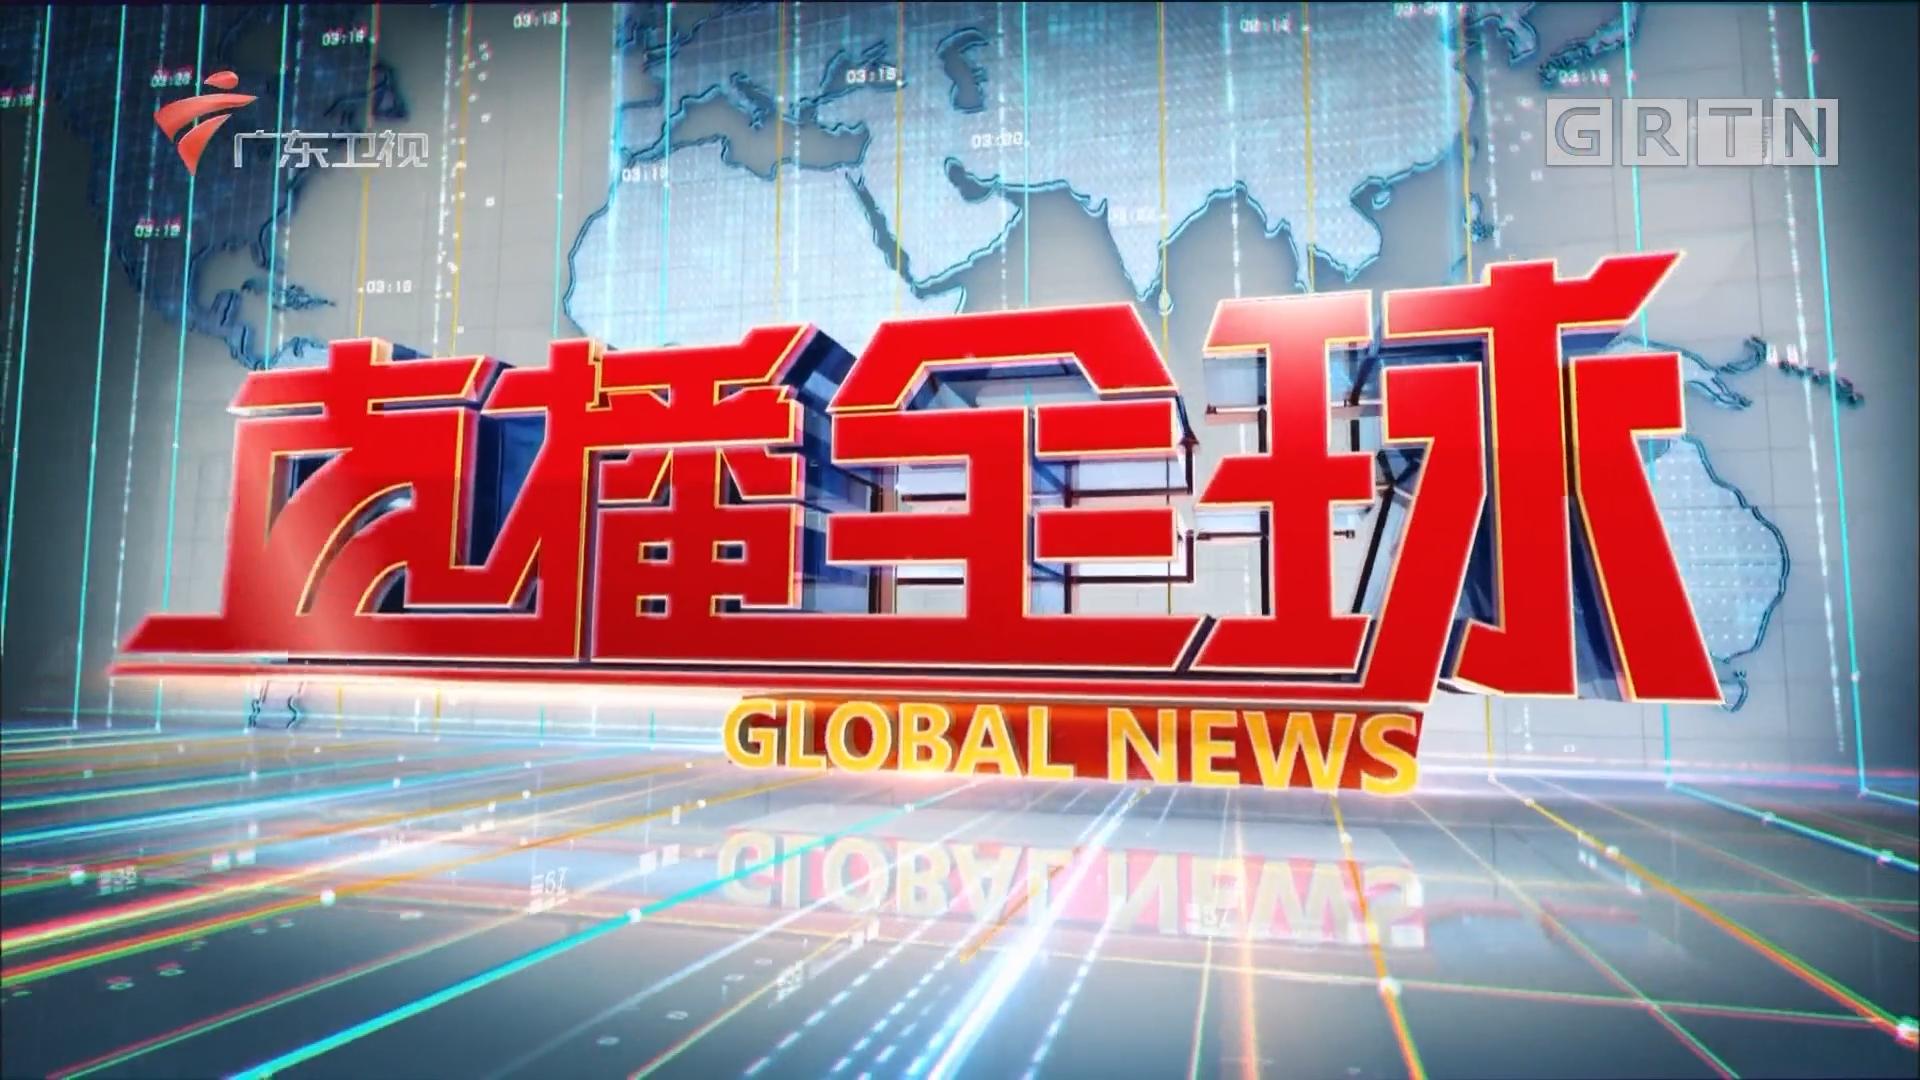 [HD][2017-10-27]直播全球:朝鲜又面临新一波制裁:美财政部扩大制裁名单